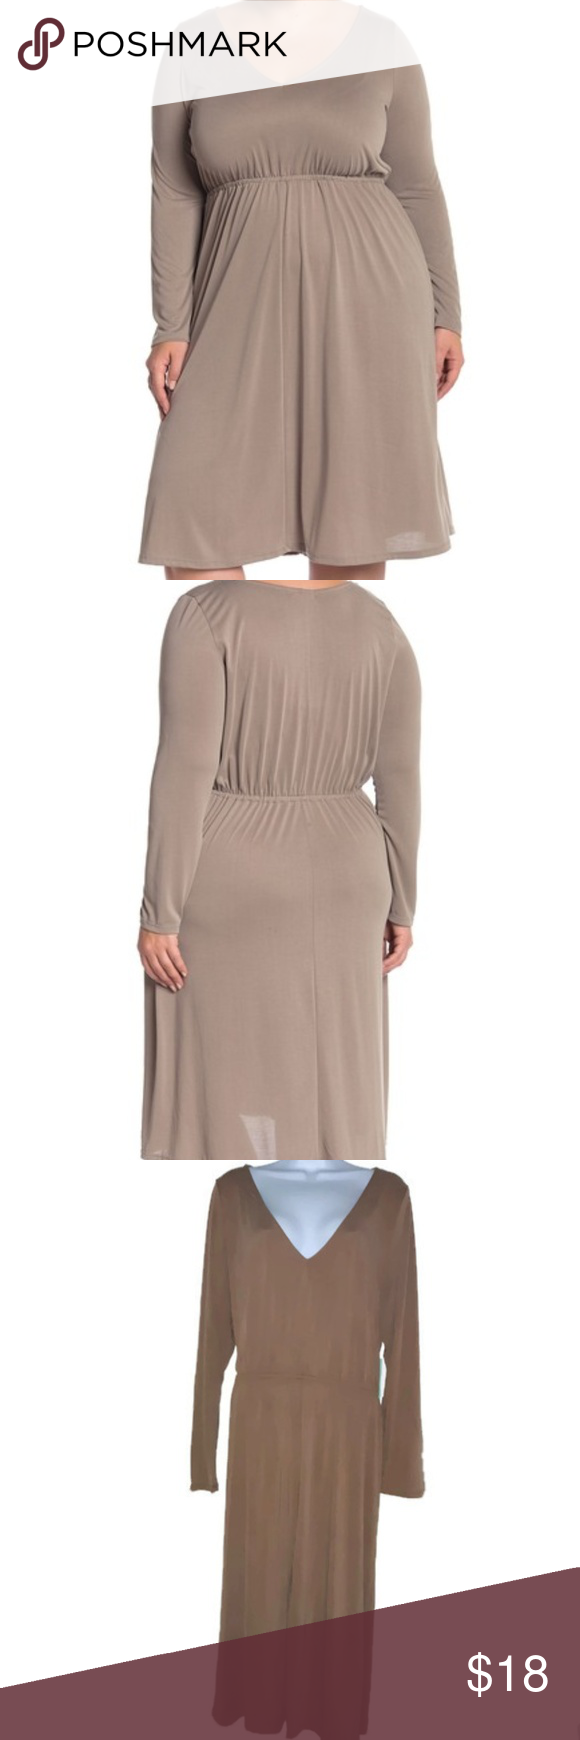 Abound Size 3x V Neck Tan Long Sleeve Midi Dress Abound Women S Size 3x V Neck Tan Long Sleeve Midi Dress Nw Long Sleeve Midi Dress Long Sleeve Midi Midi Dress [ 1740 x 580 Pixel ]